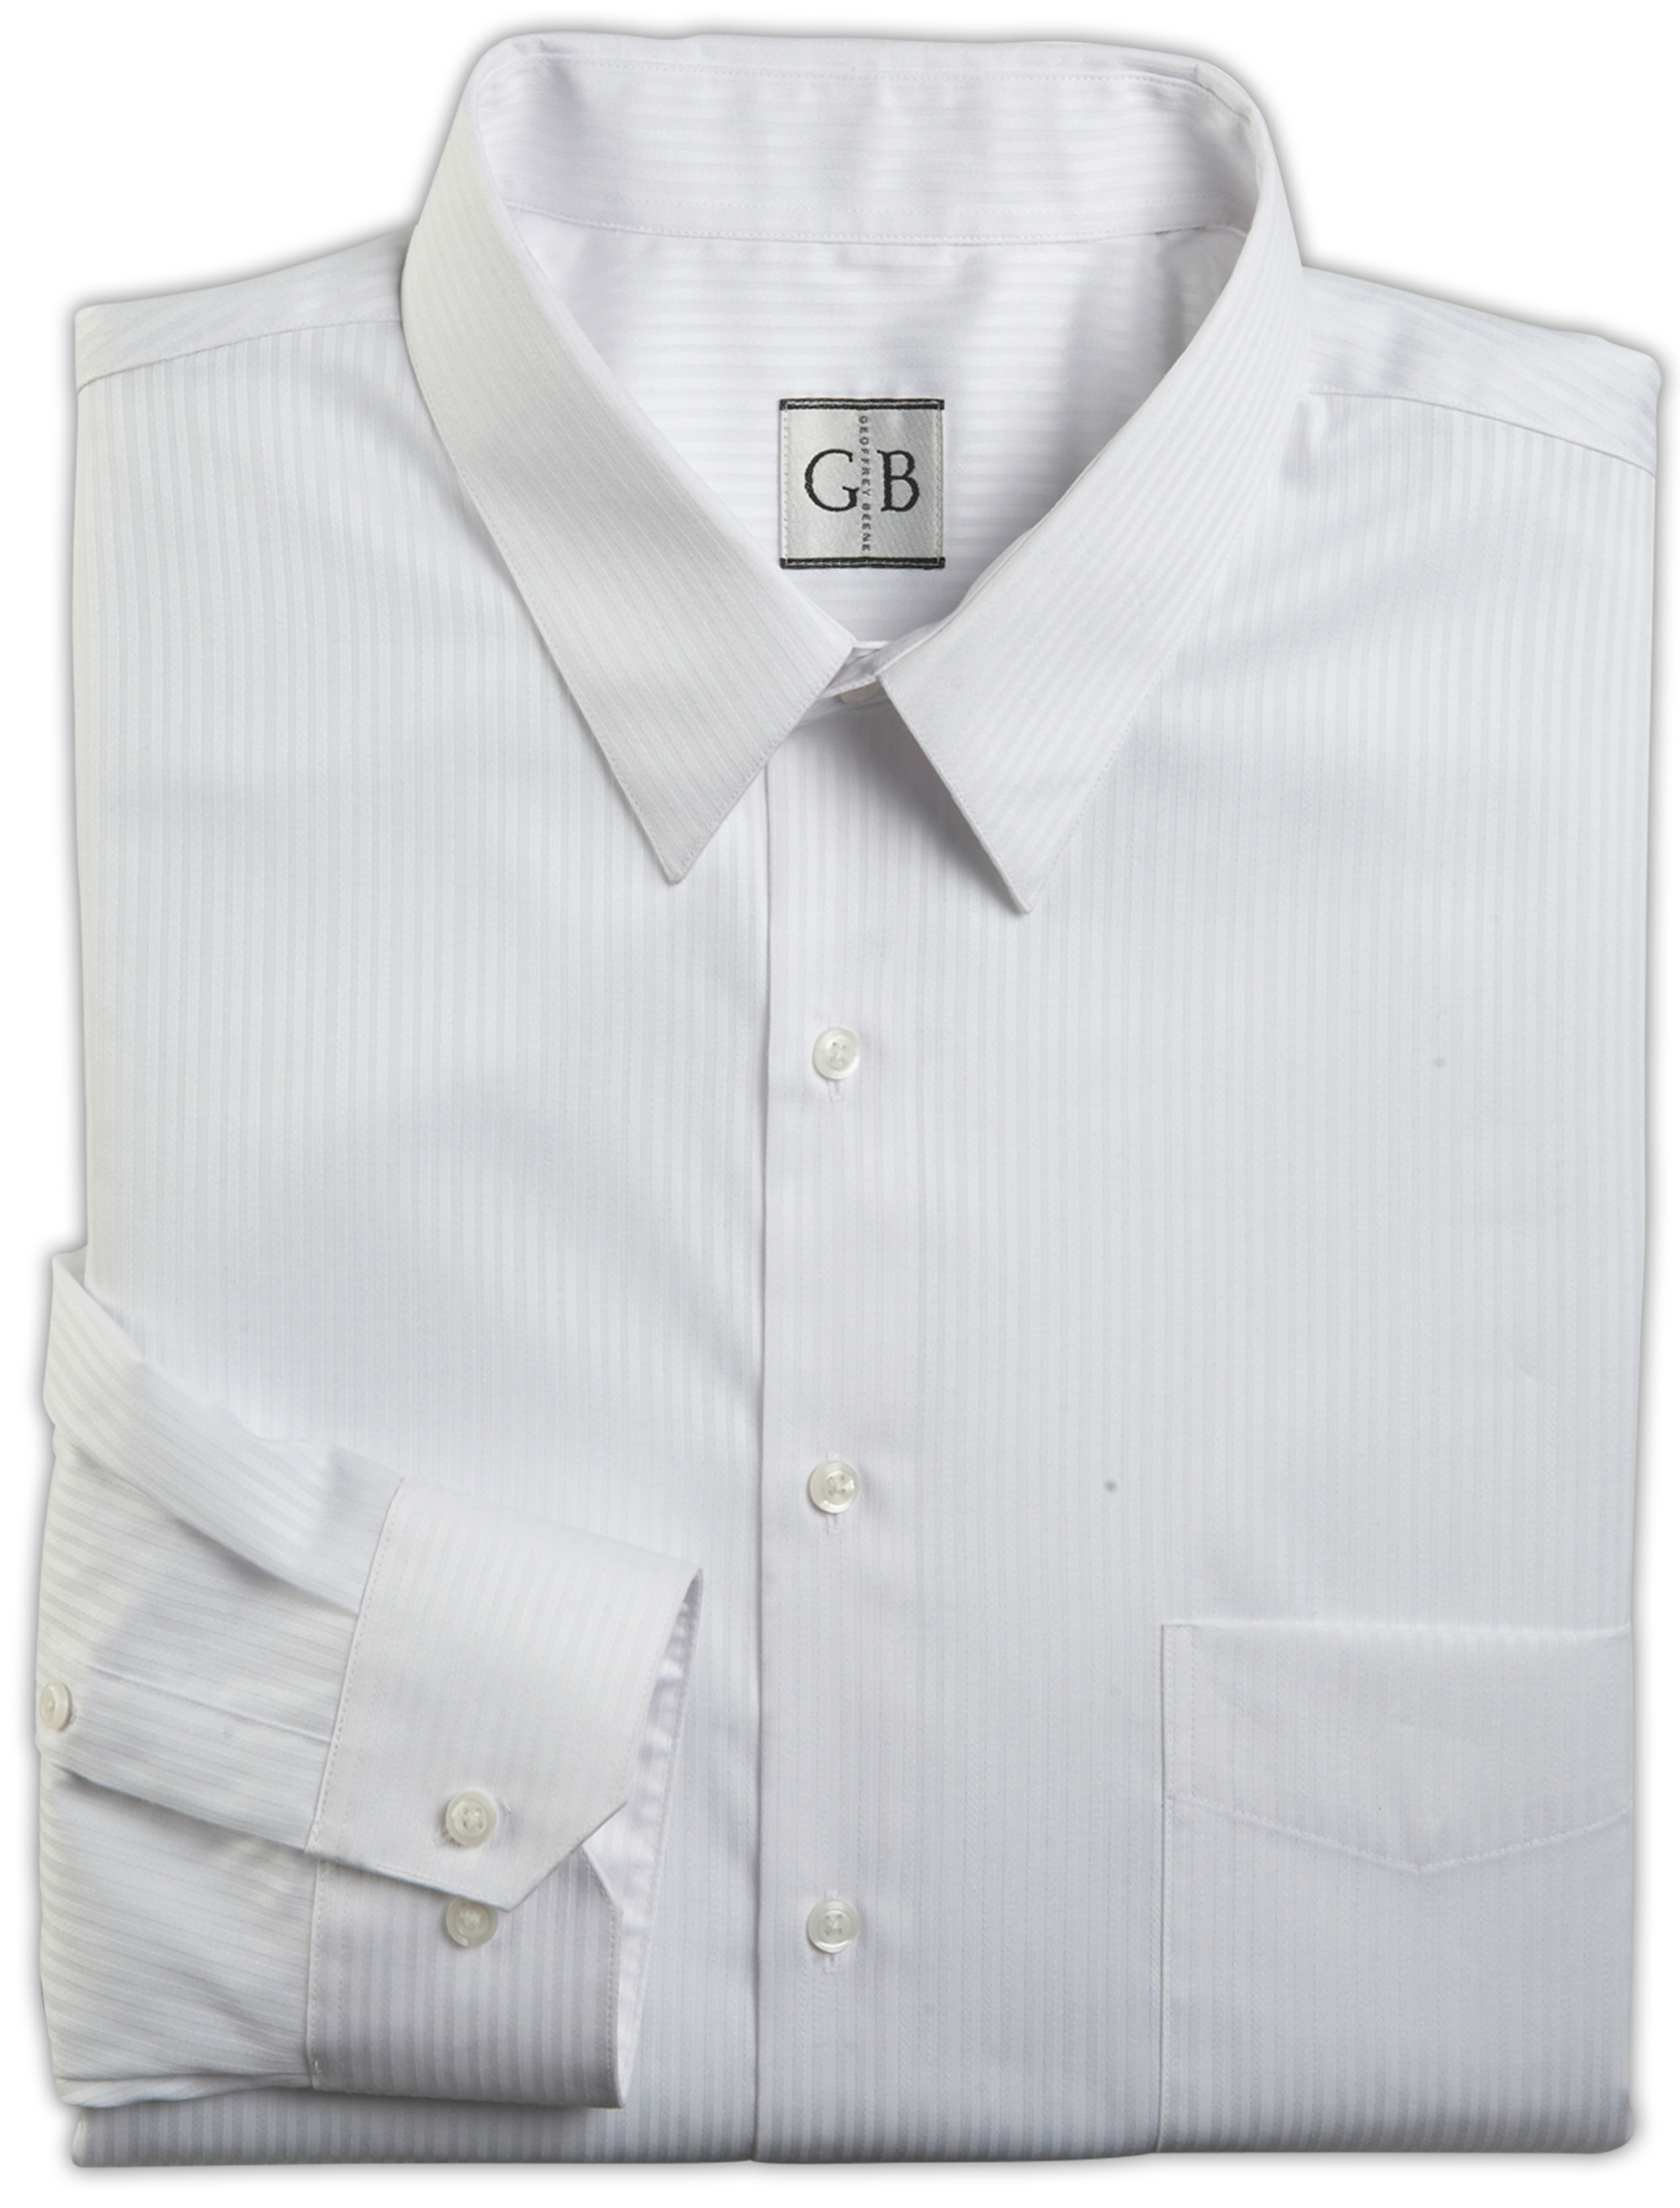 Geoffrey Beene Mens Formal Shirts Joe Maloy